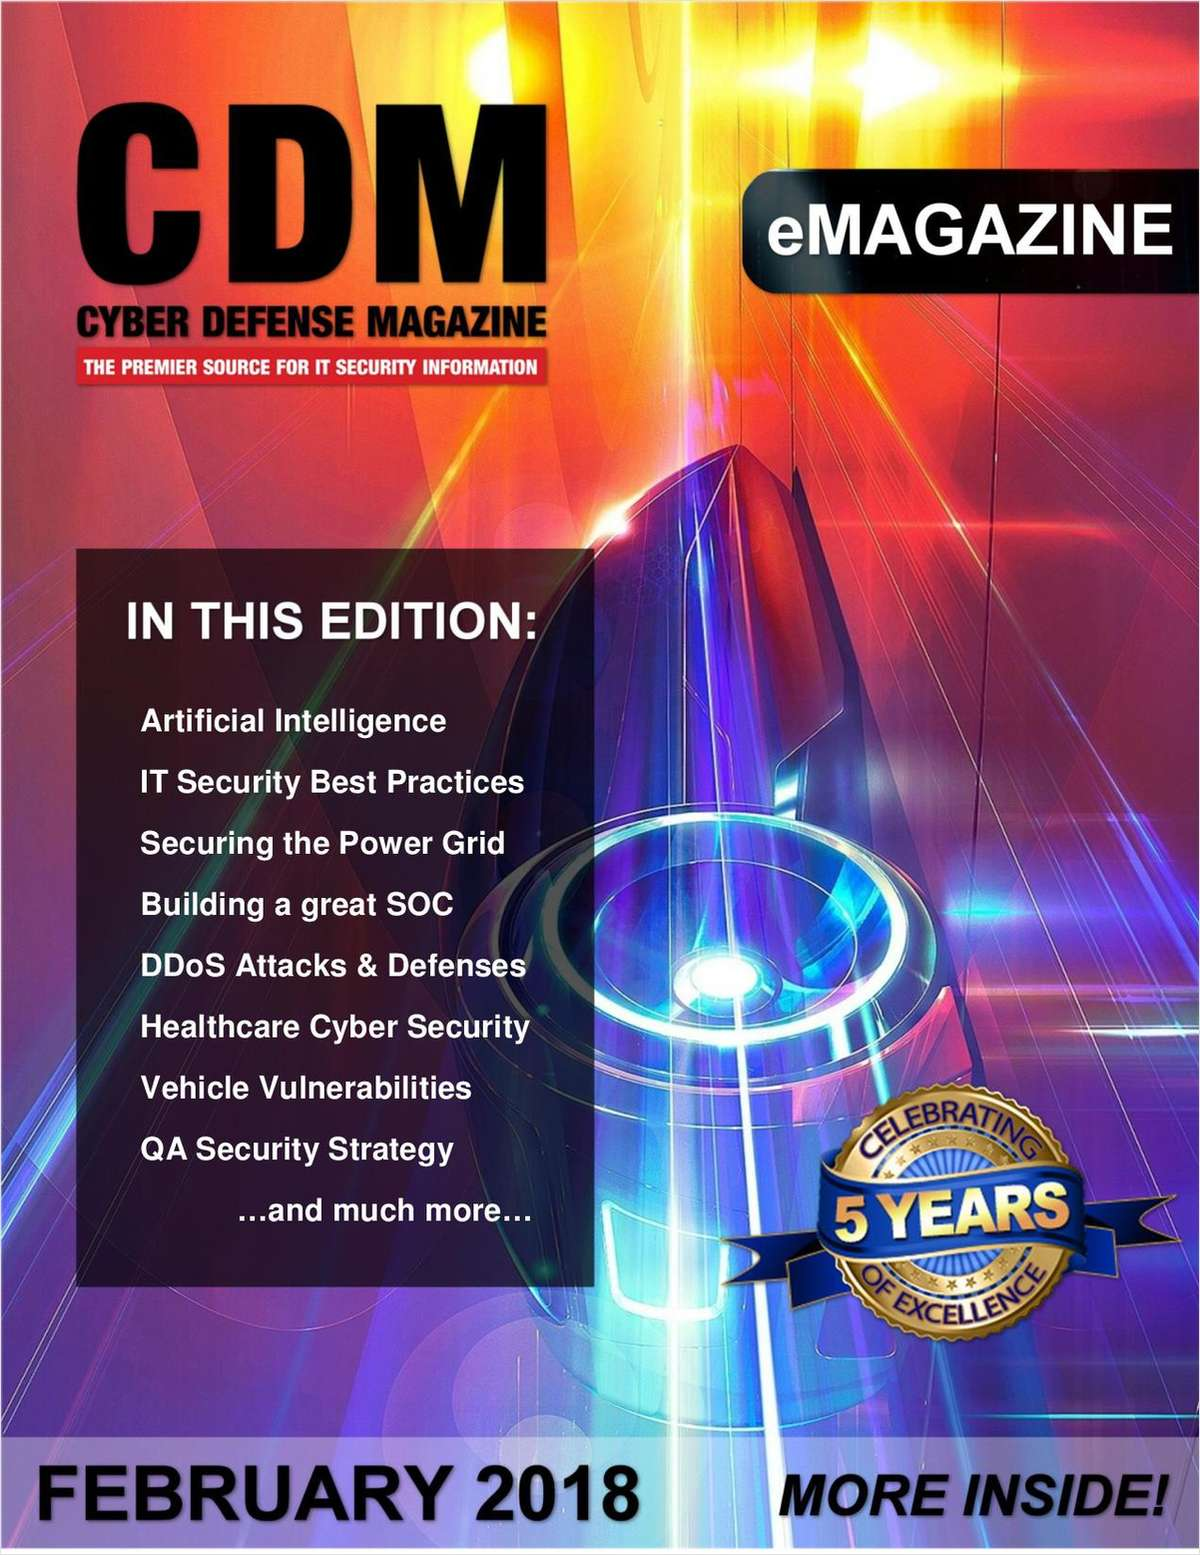 Cyber Defense Magazine - February 2018